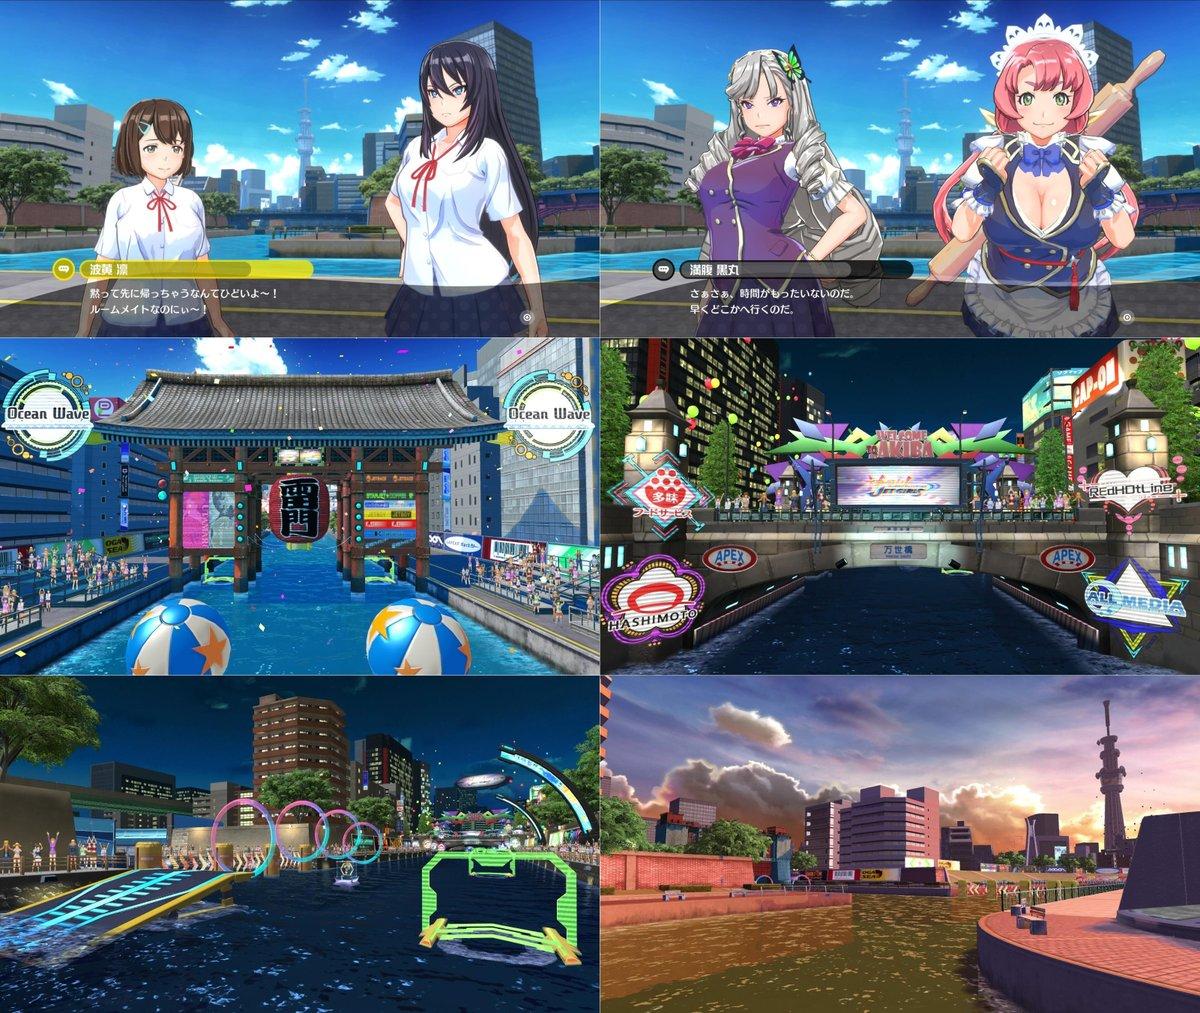 EFMUffuU0AACDkt - カグラ高木最新作、PS4『神田川JET GIRLS』2020年1月16日発売決定!